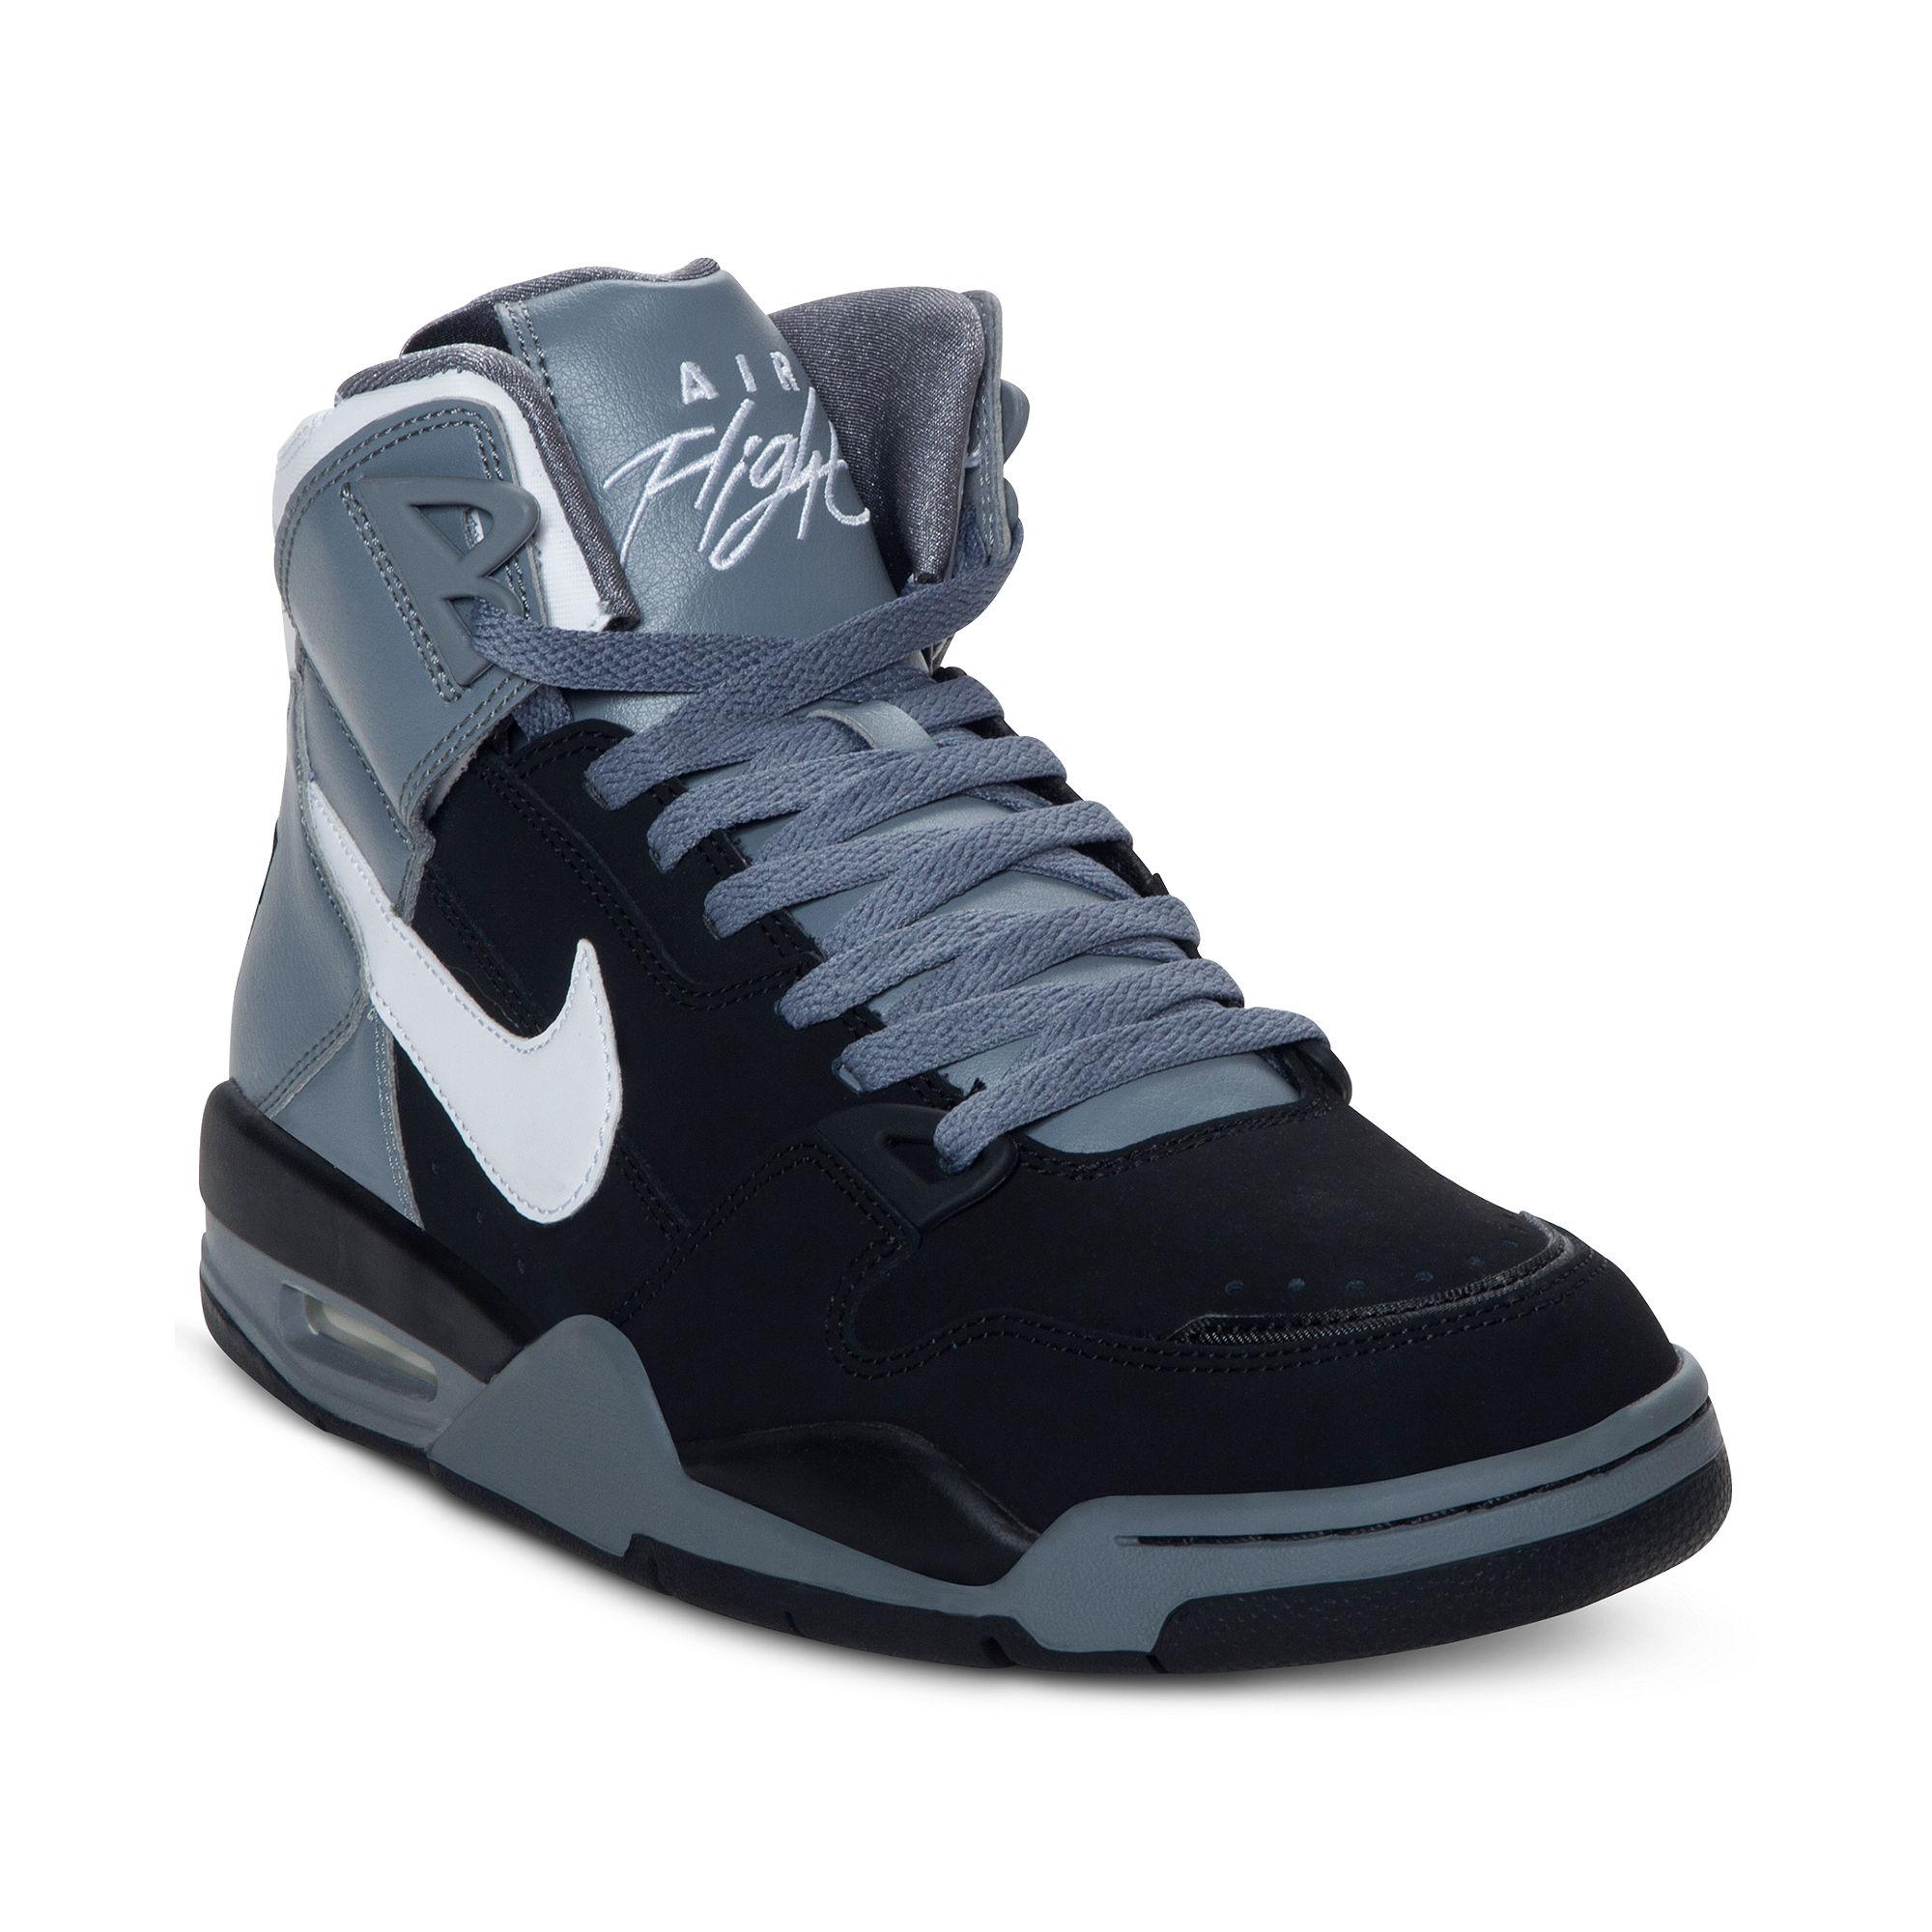 Nike Air Flight Condor High Basketball Shoes